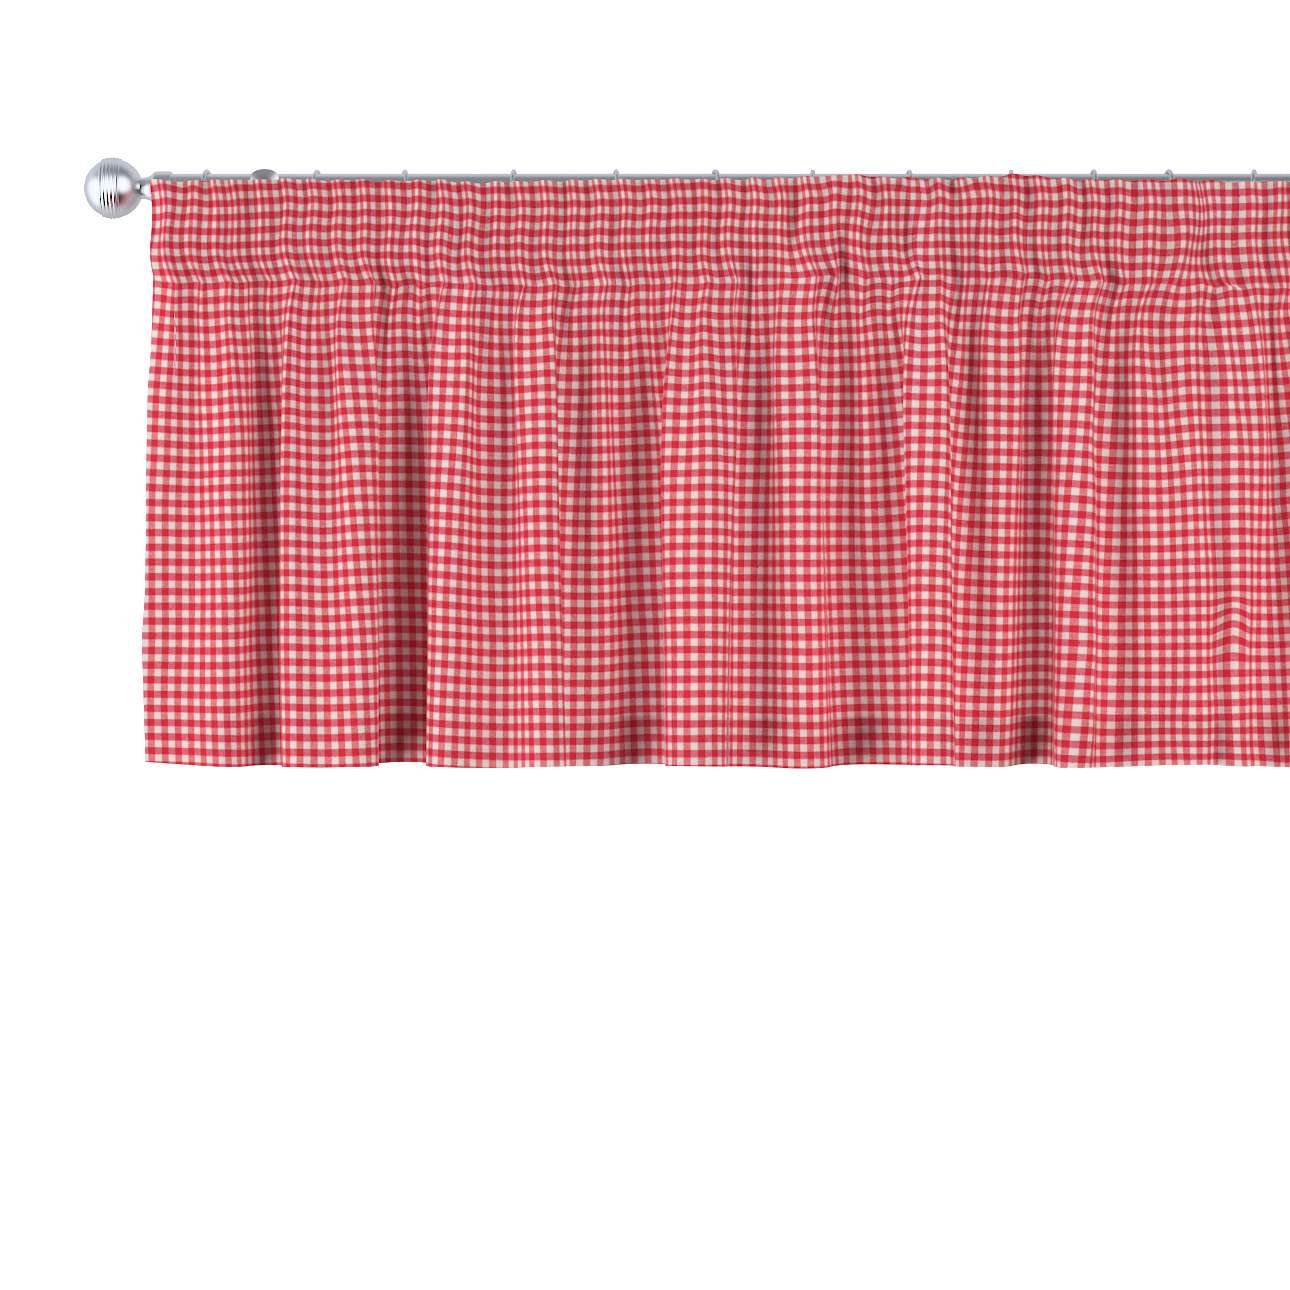 Kurzgardine mit Kräuselband, rot-ecru , 130 × 40 cm, Quadro